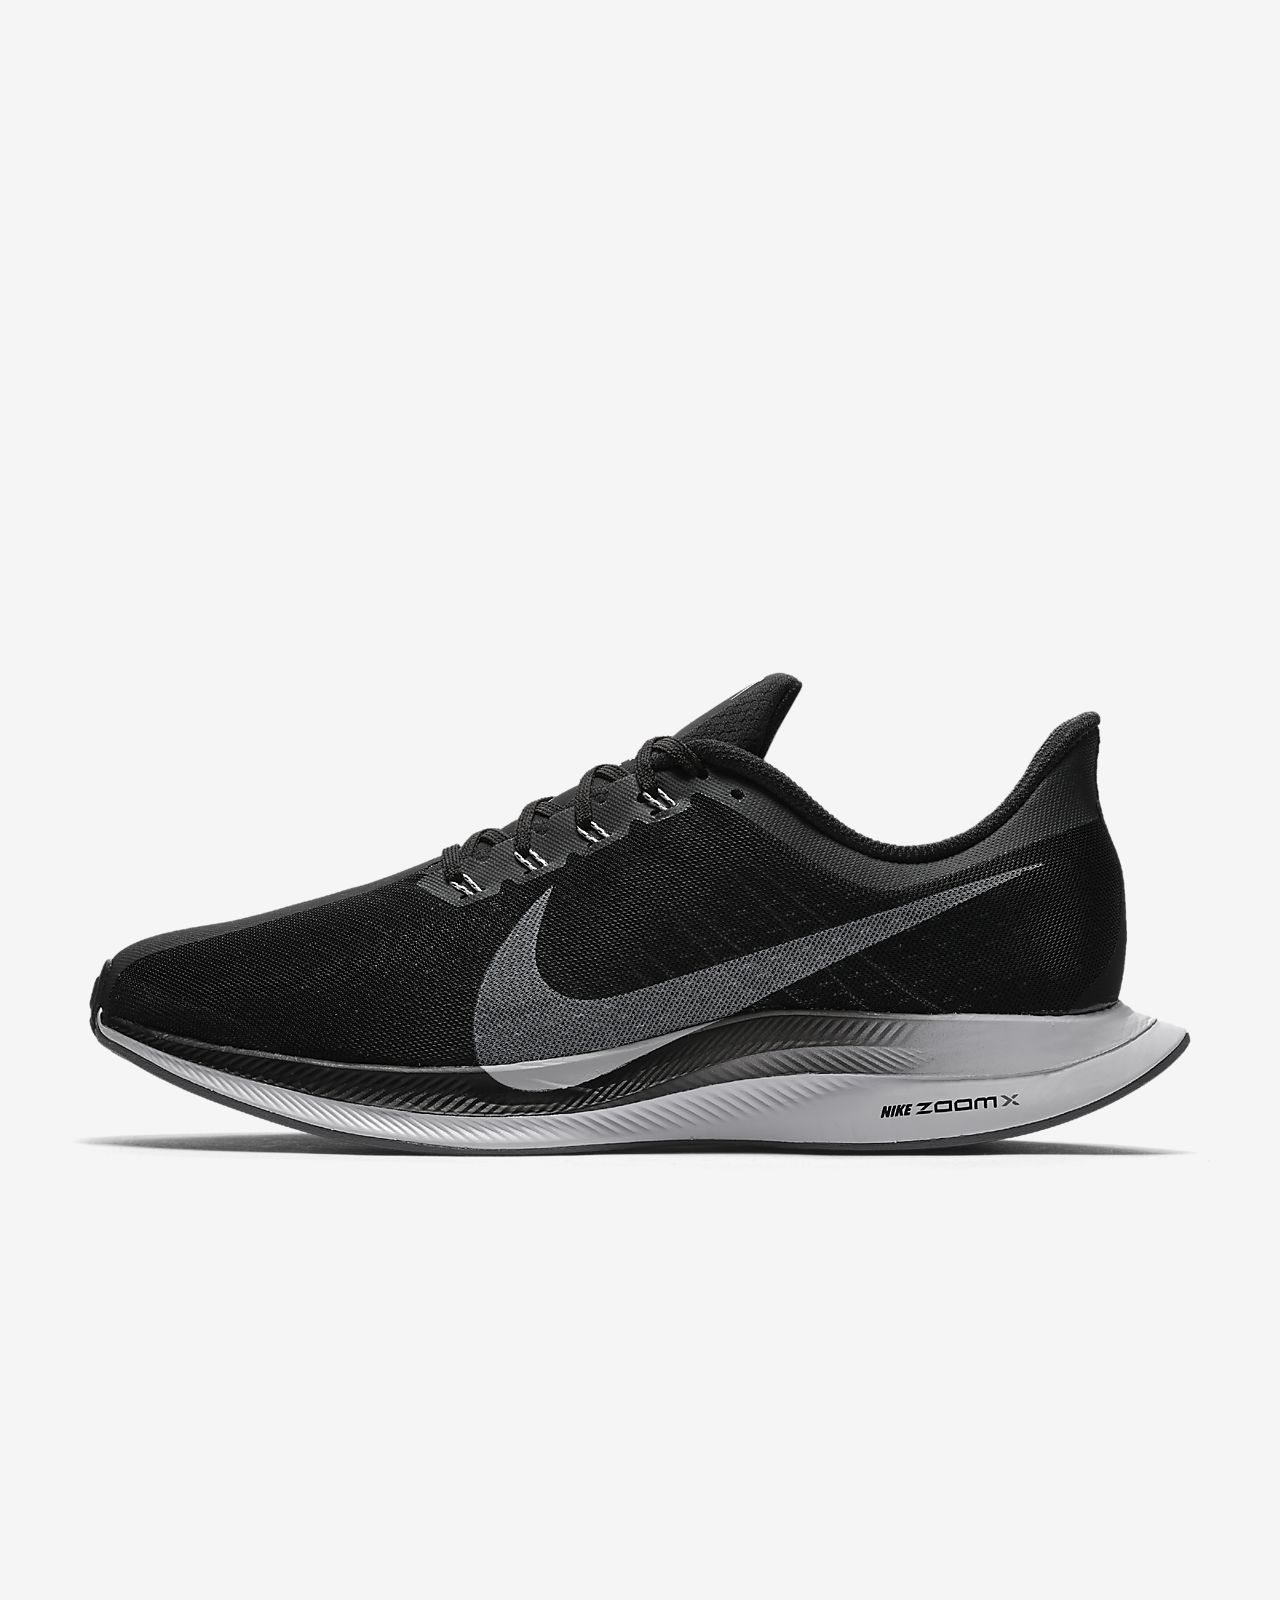 on sale 5ef8e effc2 Nike Zoom Pegasus Turbo